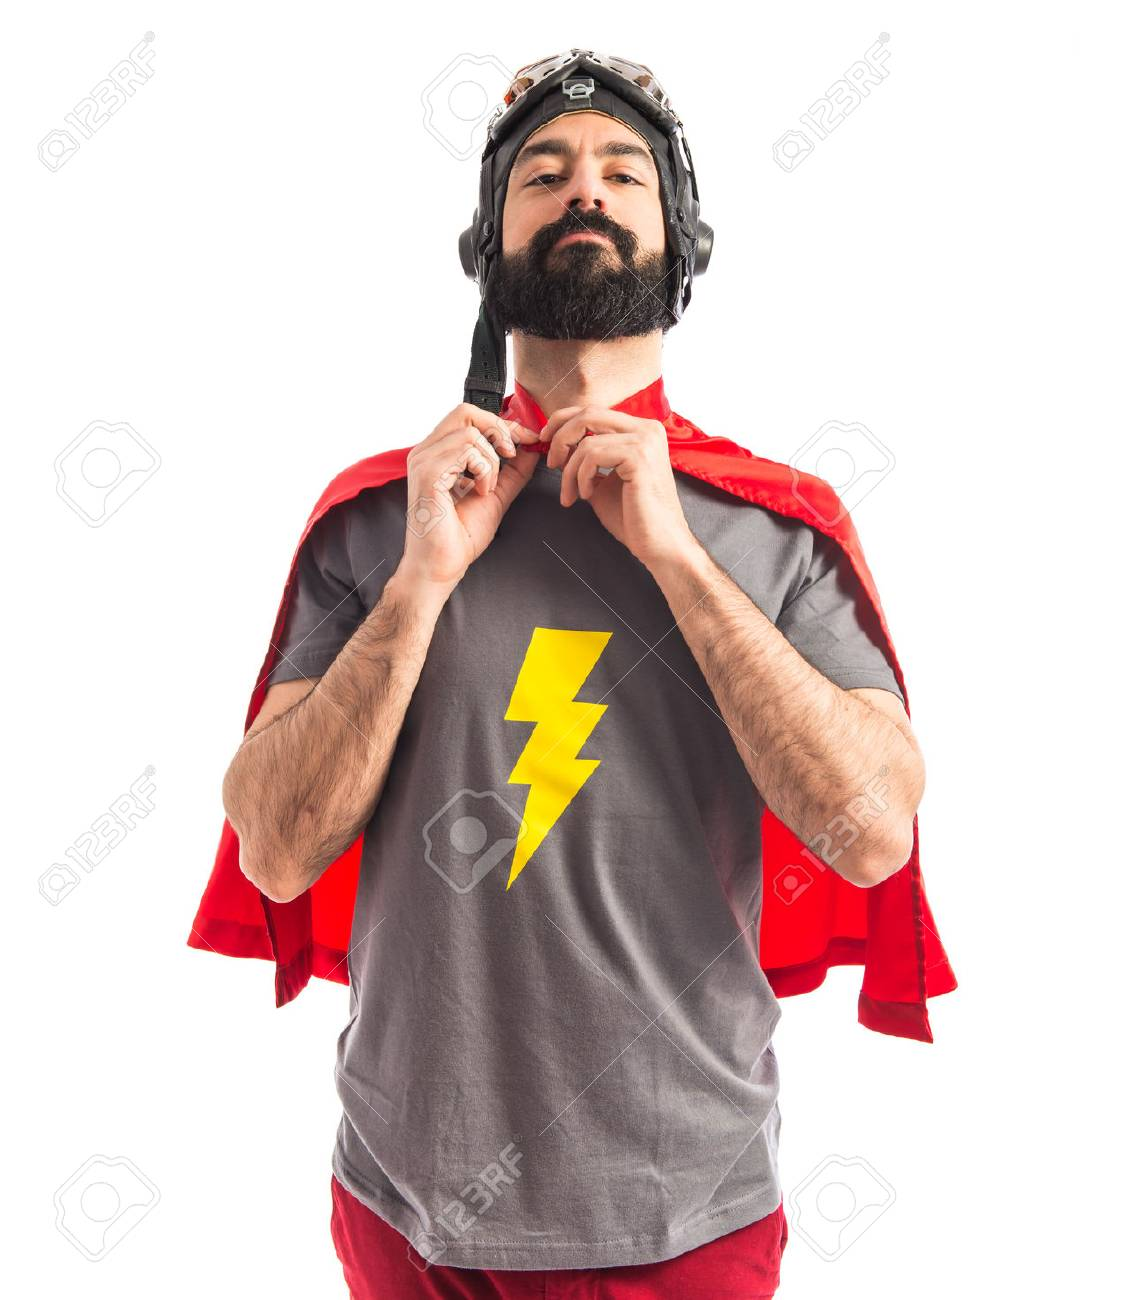 Superhero over white background Stock Photo - 40412317